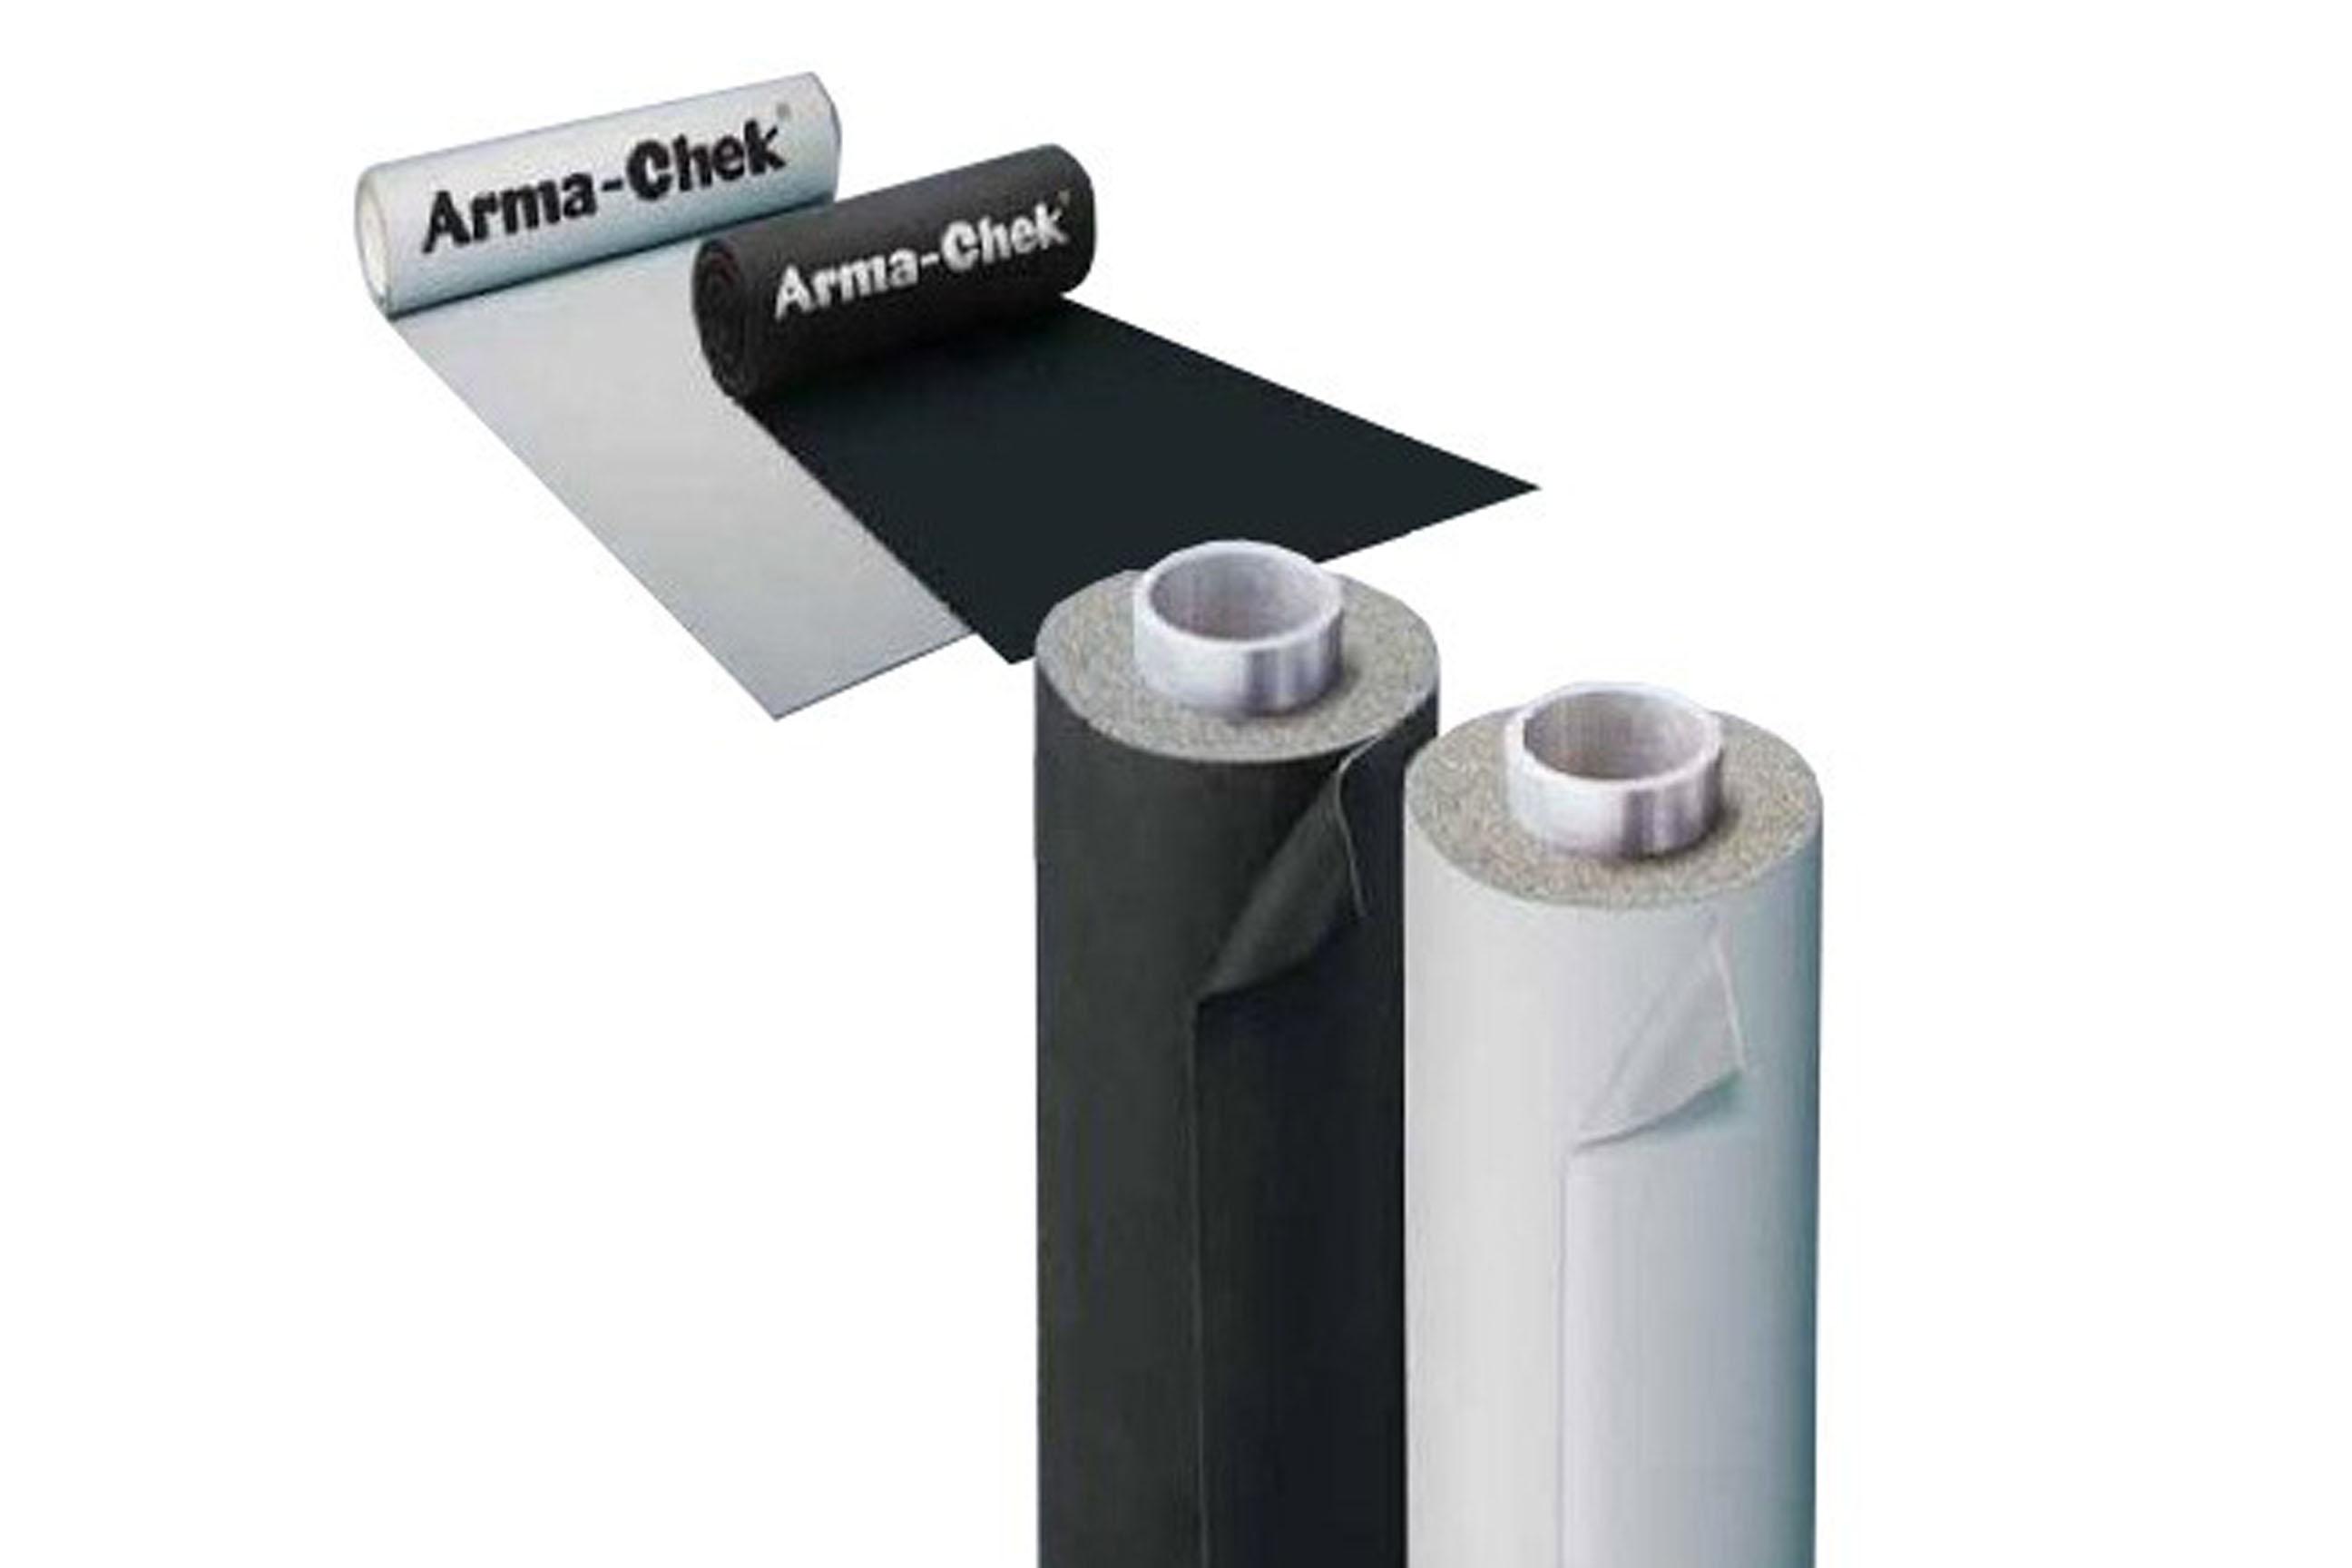 Izolatie pentru aplicatii industriale Armacell Arma-Chek D  ARMACELL - Poza 22